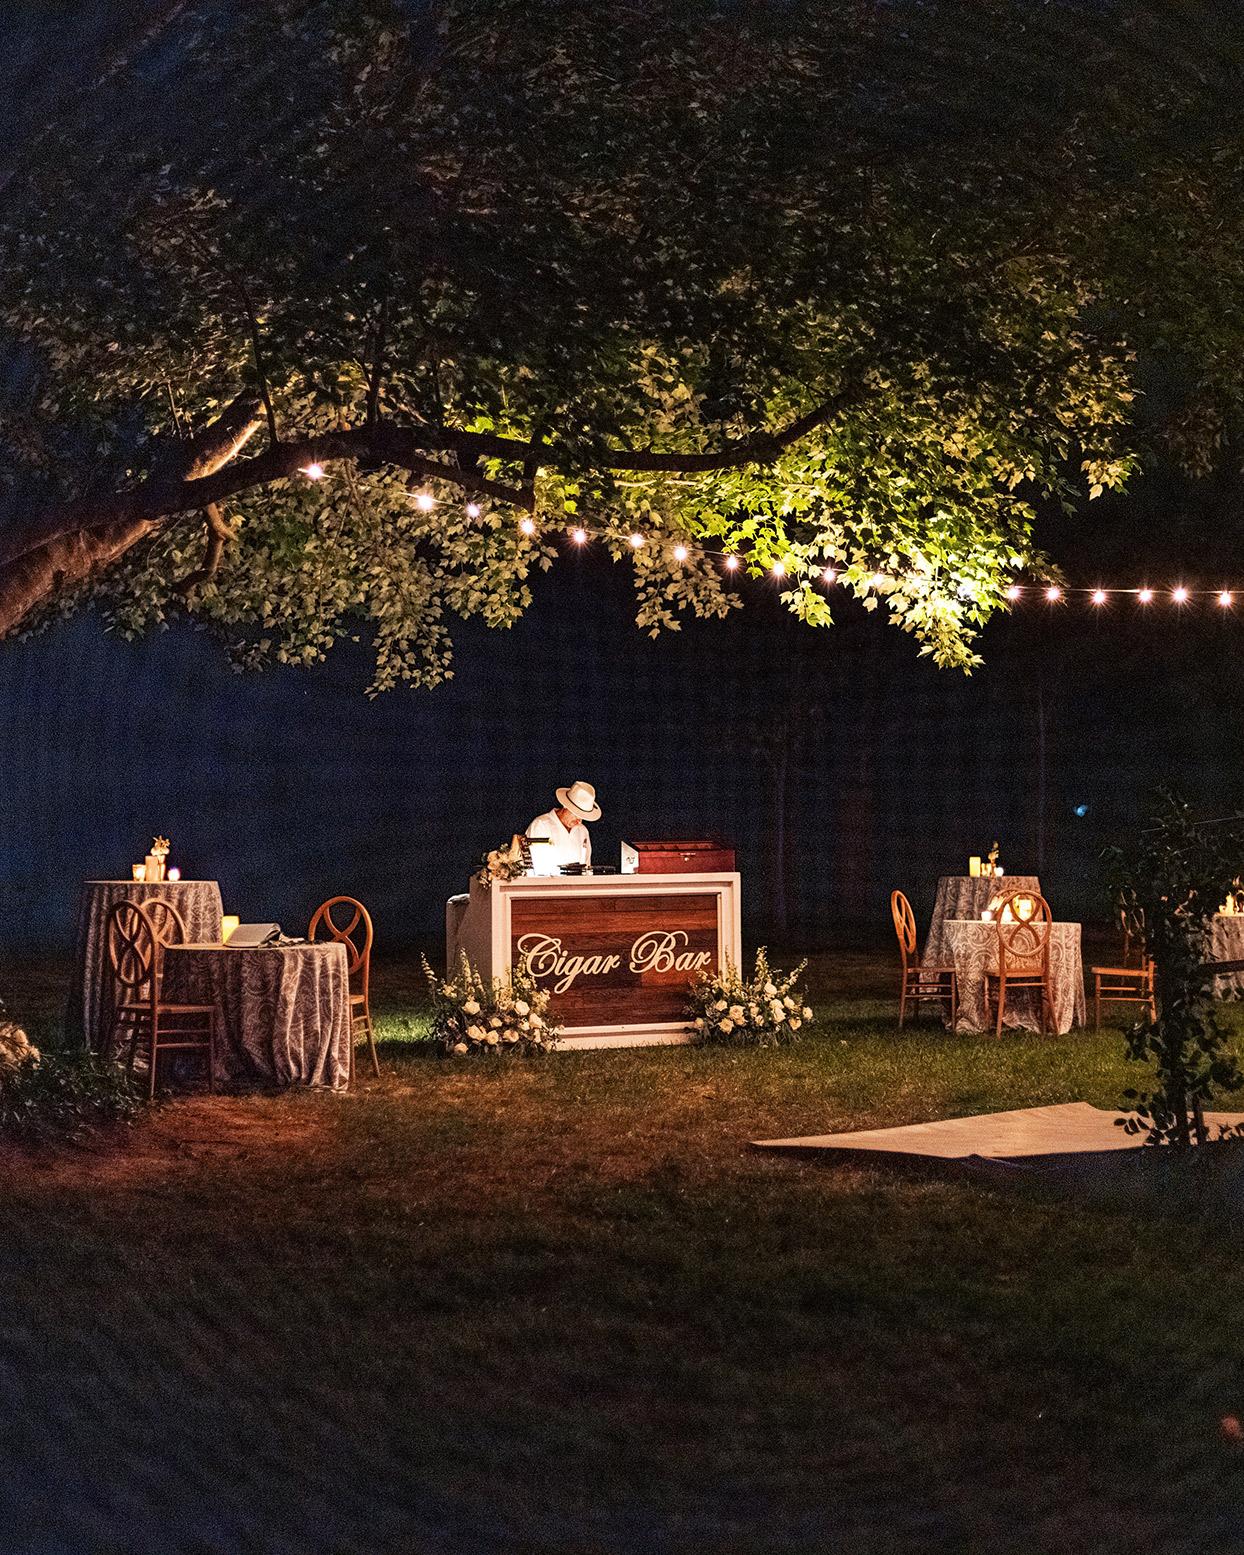 lauren chris wedding cigar bar lit under trees